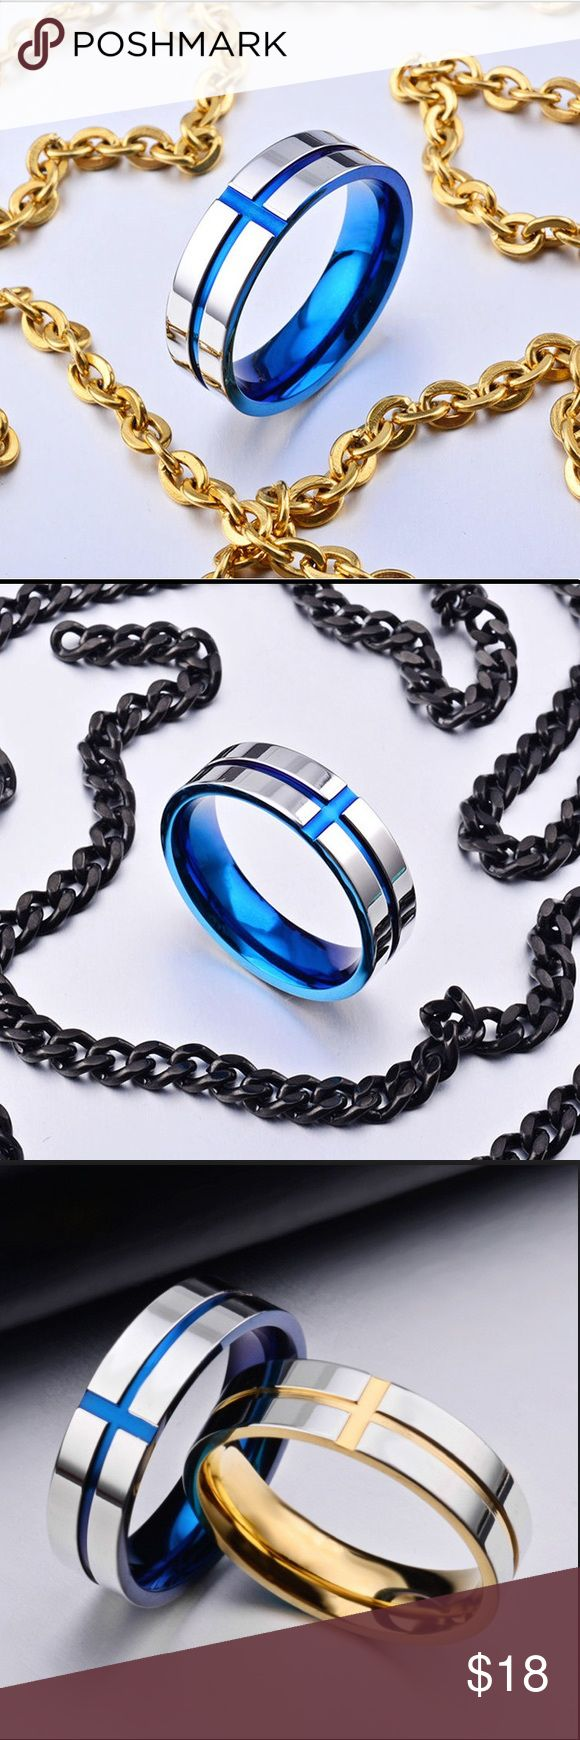 6mm Silver Titanium Steel Blue Cross Ring stainles 6mm Silver Titanium Steel Blu…